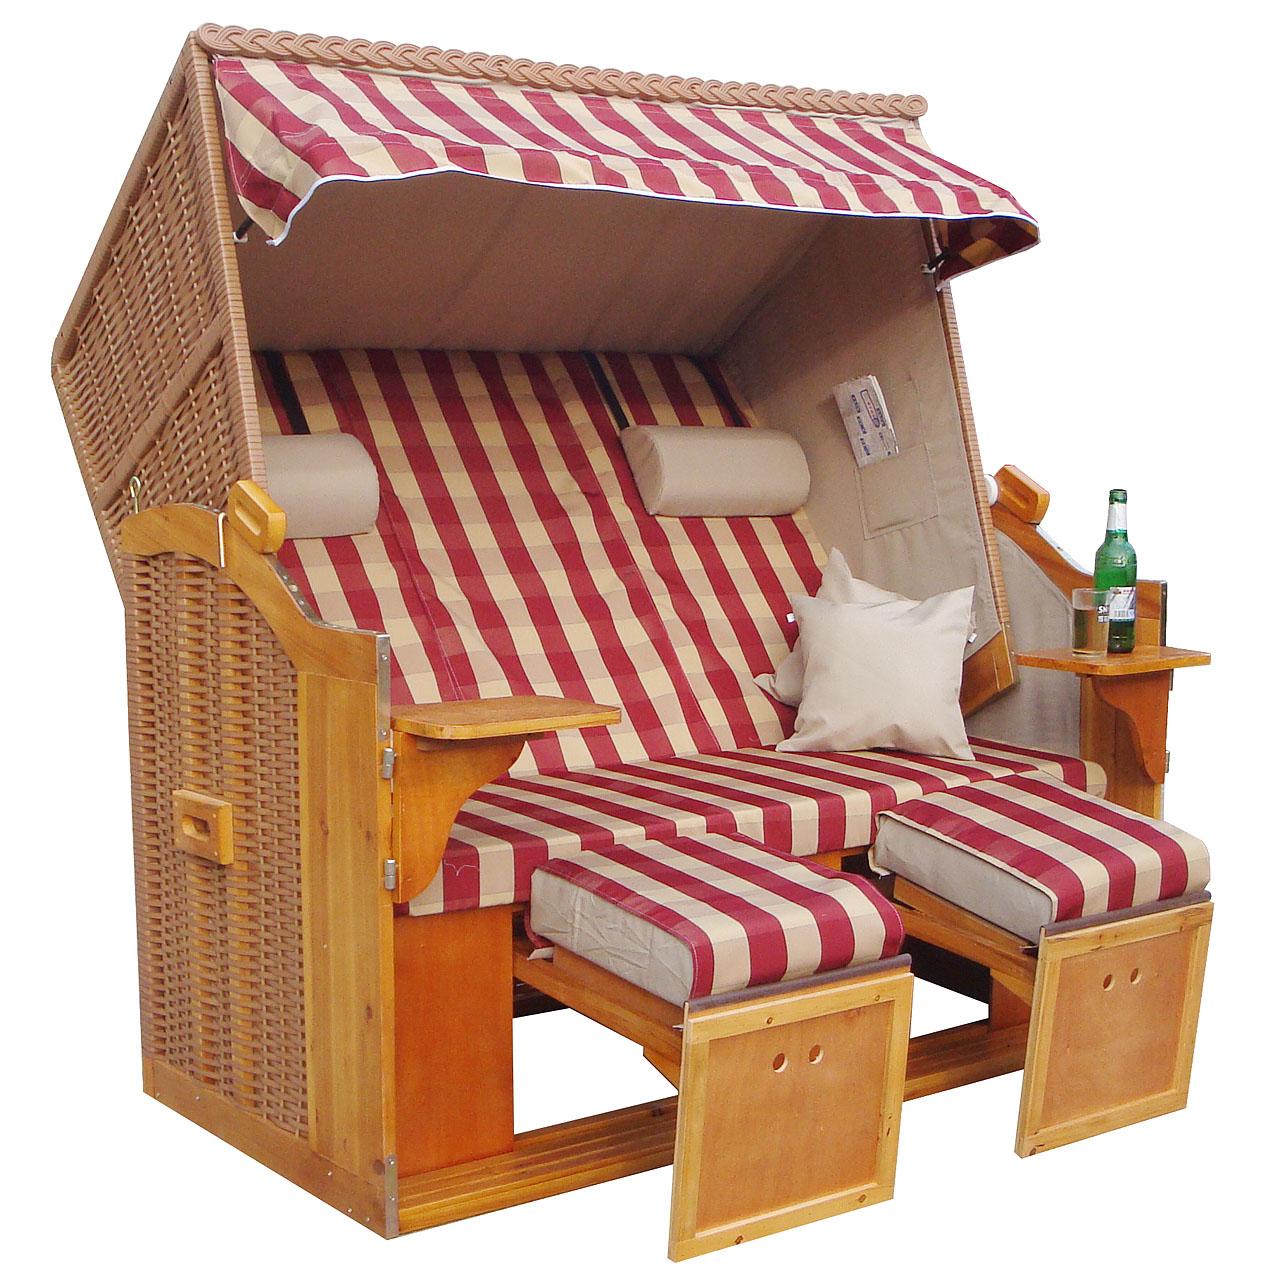 strandkorb 160cm premium ostsee volllieger sylt hollywoodschaukel zubeh r be ebay. Black Bedroom Furniture Sets. Home Design Ideas